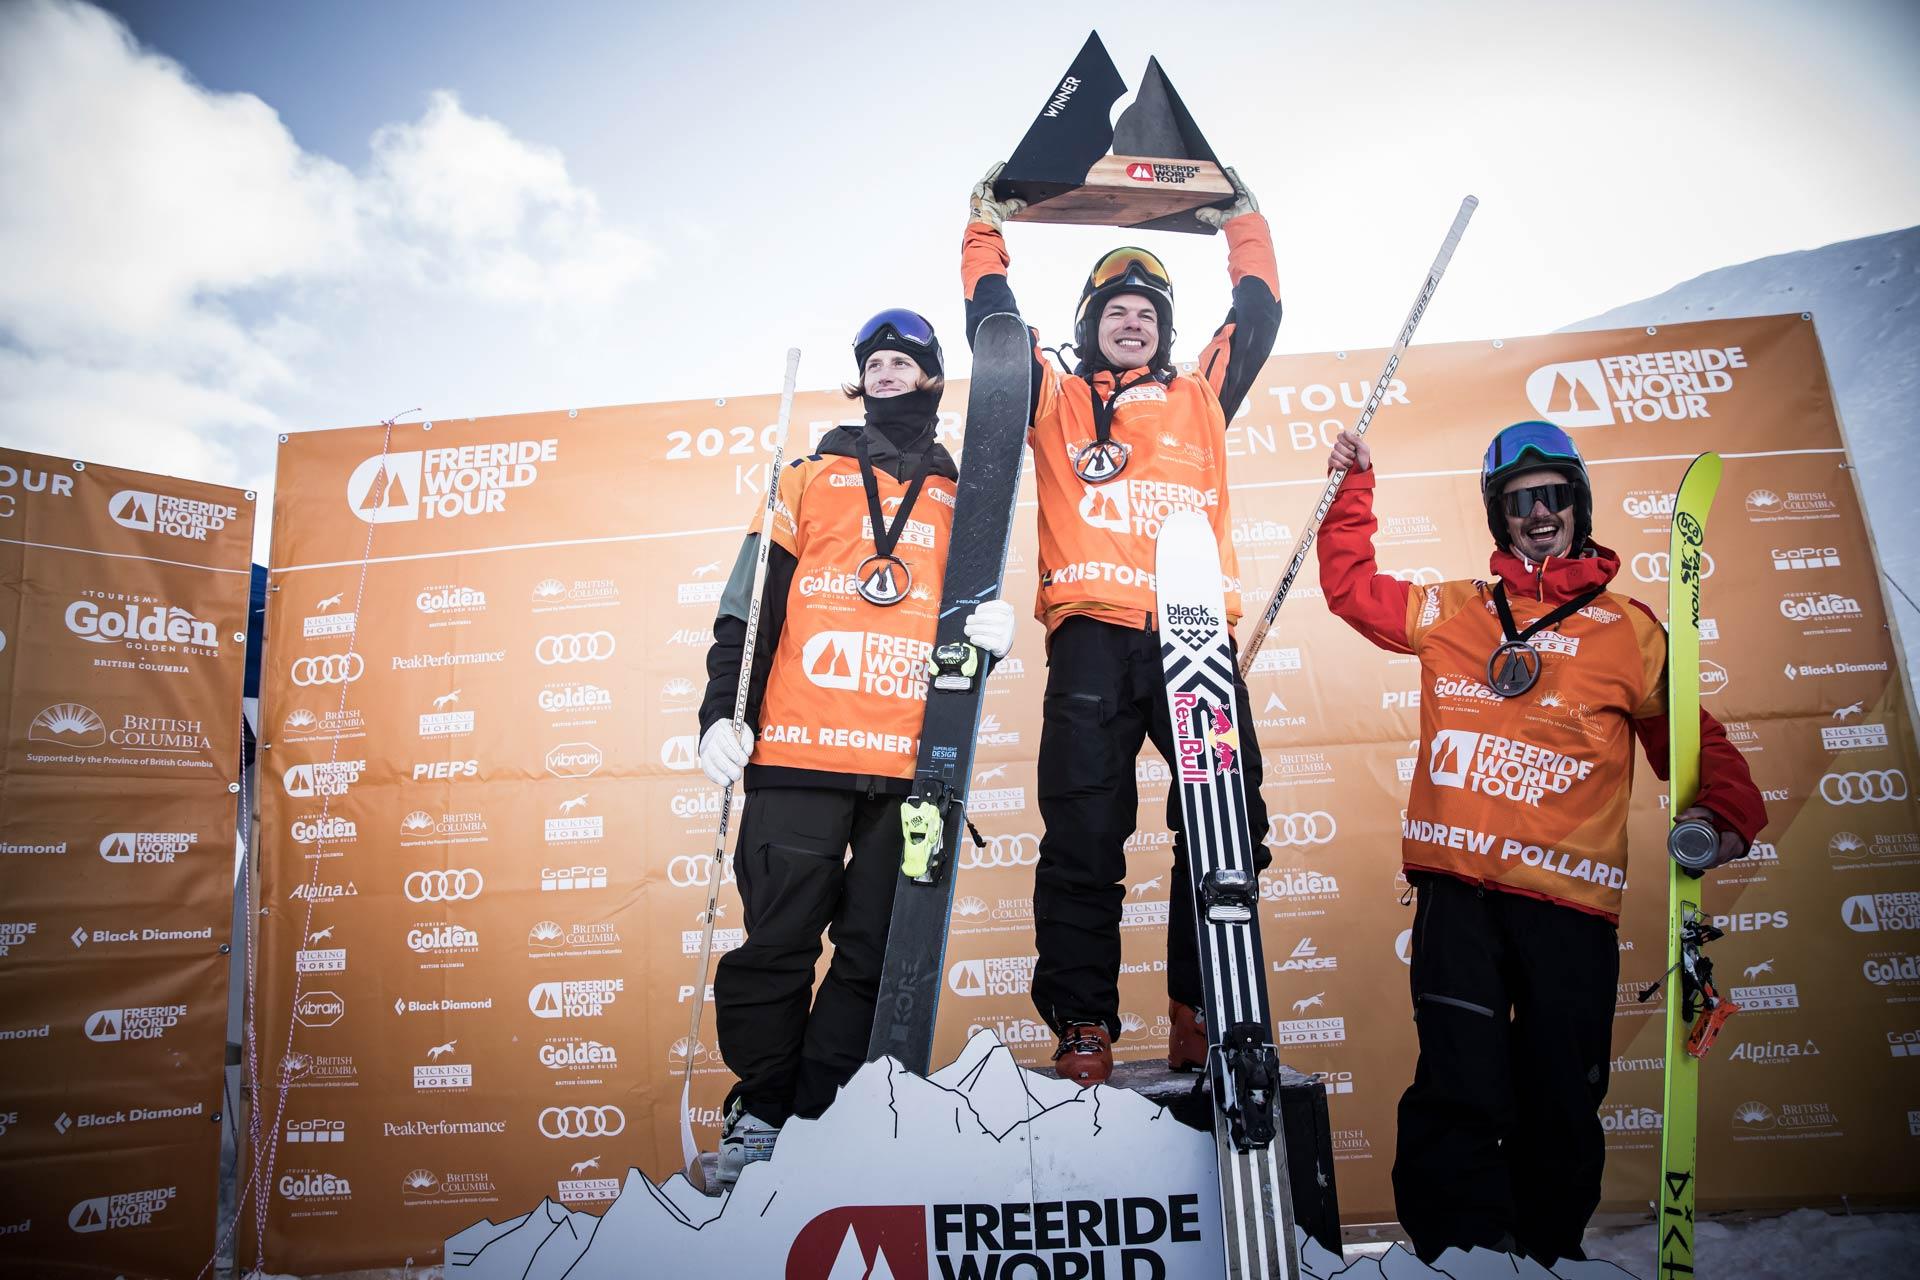 Die drei besten Männer in Kanda: Carl Regnér Eriksson (SWE), Kristofer Turdell (SWE), Andrew Pollard (USA) - Foto: freerideworldtour.com / D. Daher